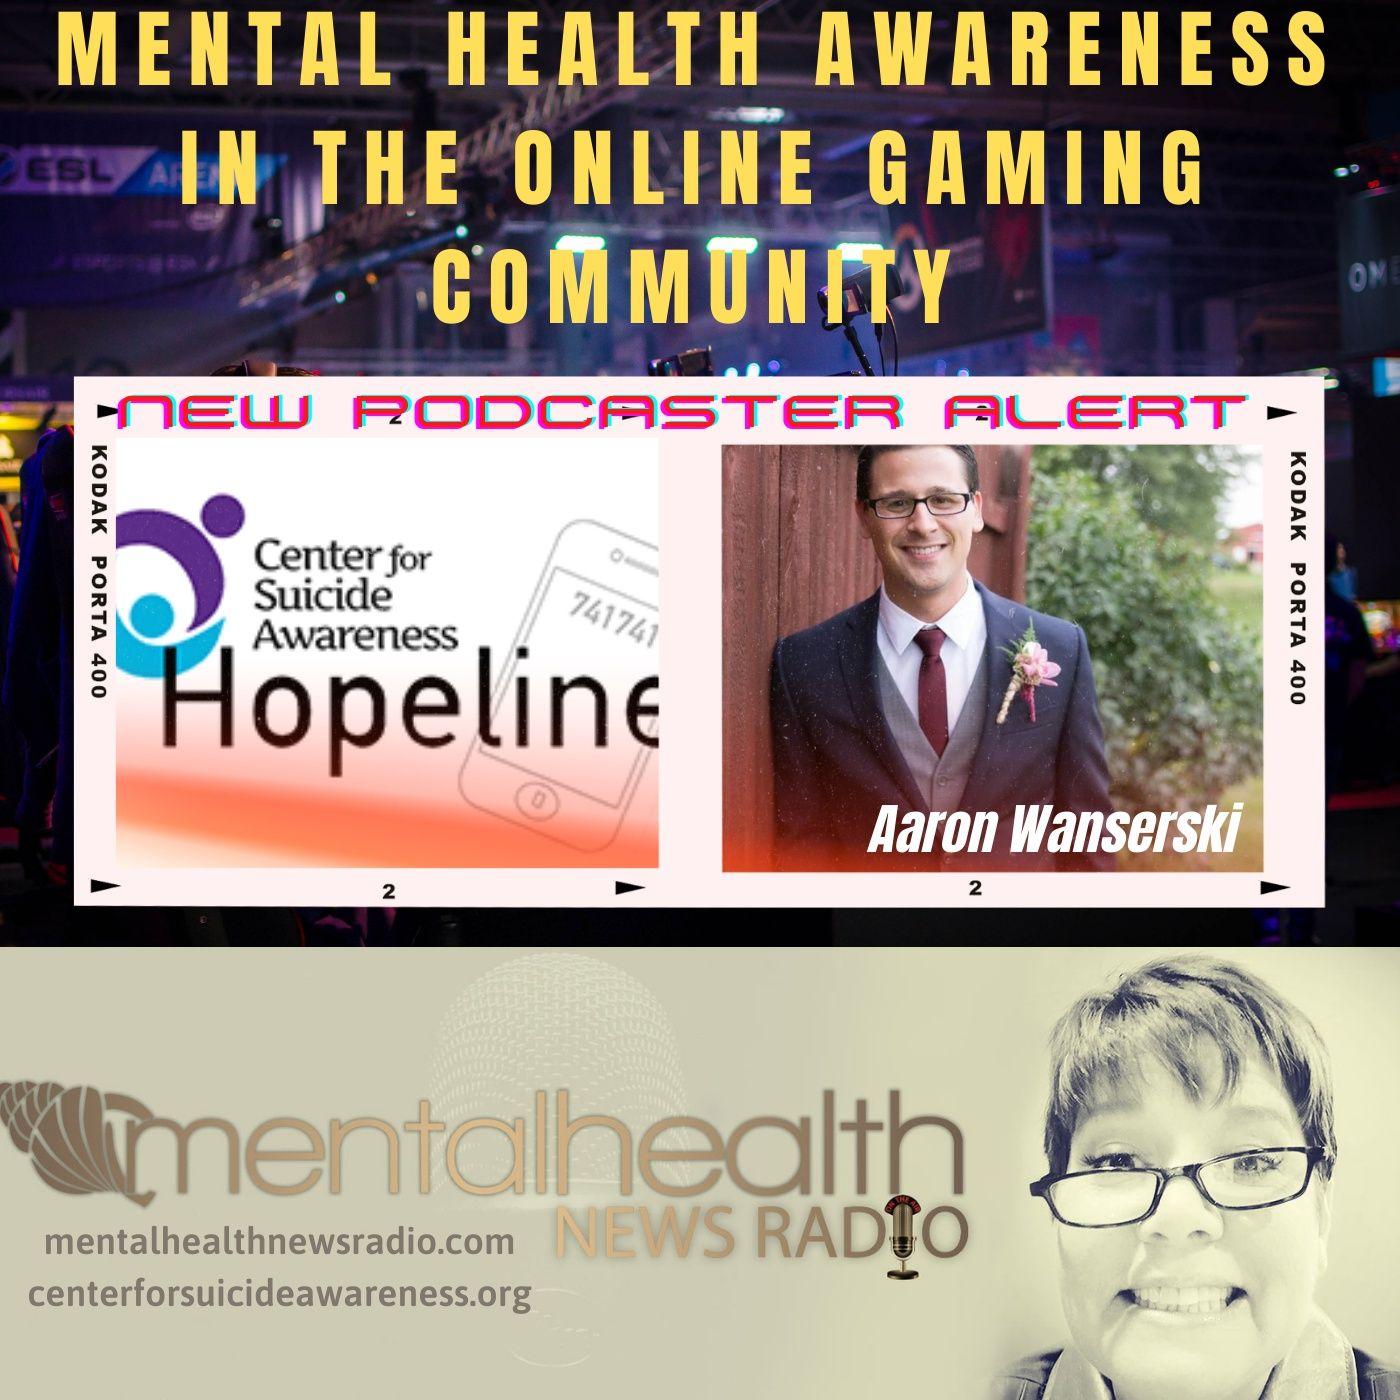 Mental Health News Radio - Mental Health Awareness in the Online Gaming Community